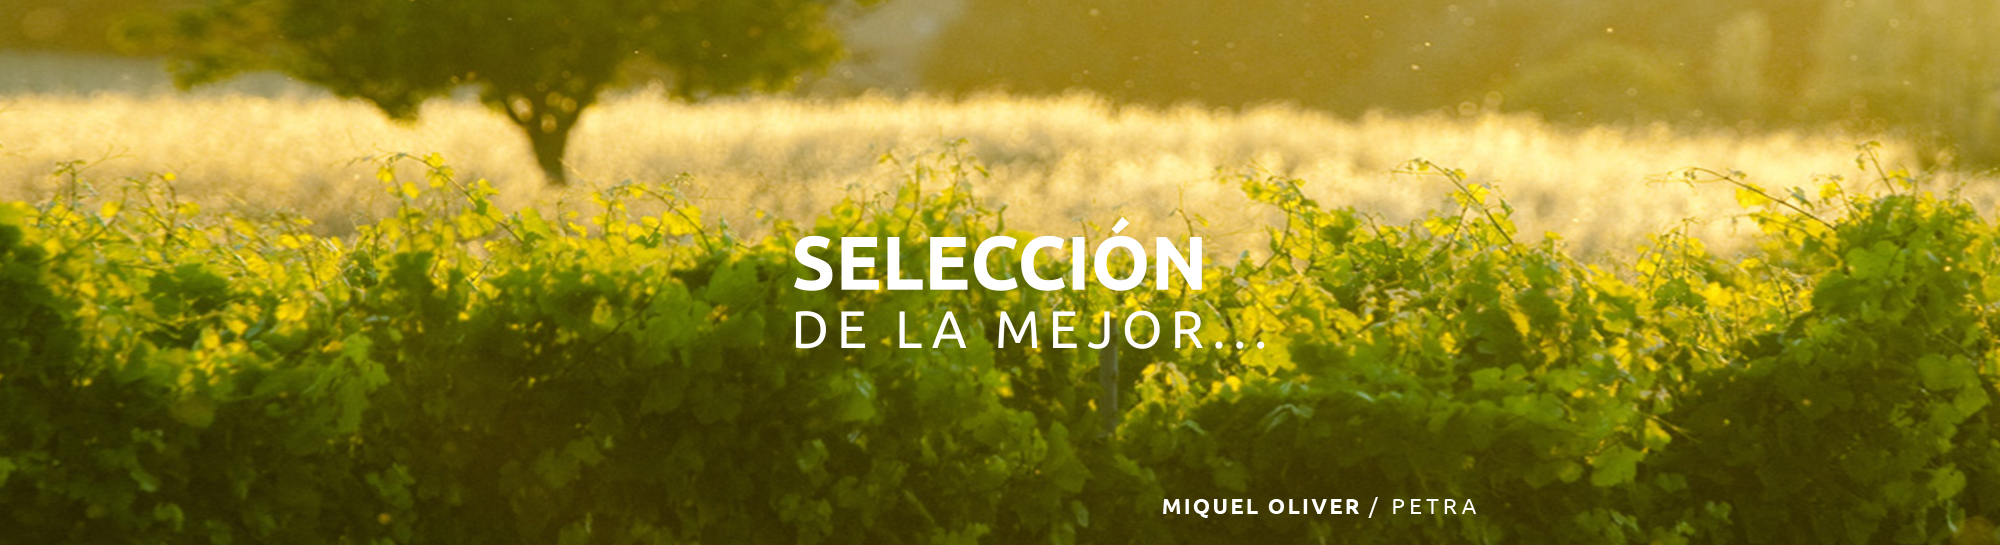 miquel1